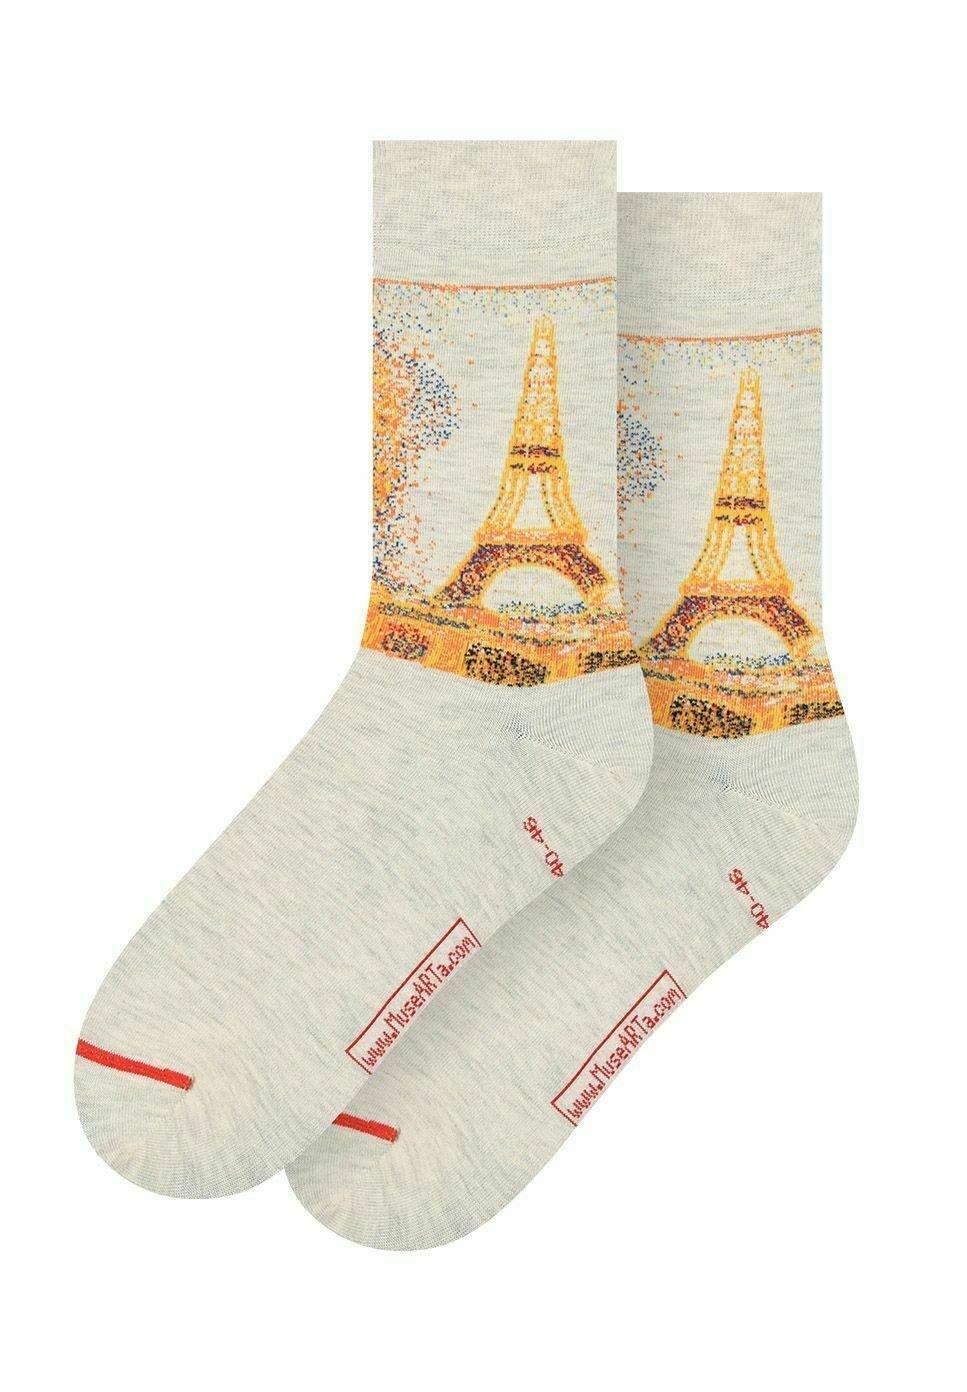 Femme GEORGES SEURAT: EIFFEL TOWER - Chaussettes